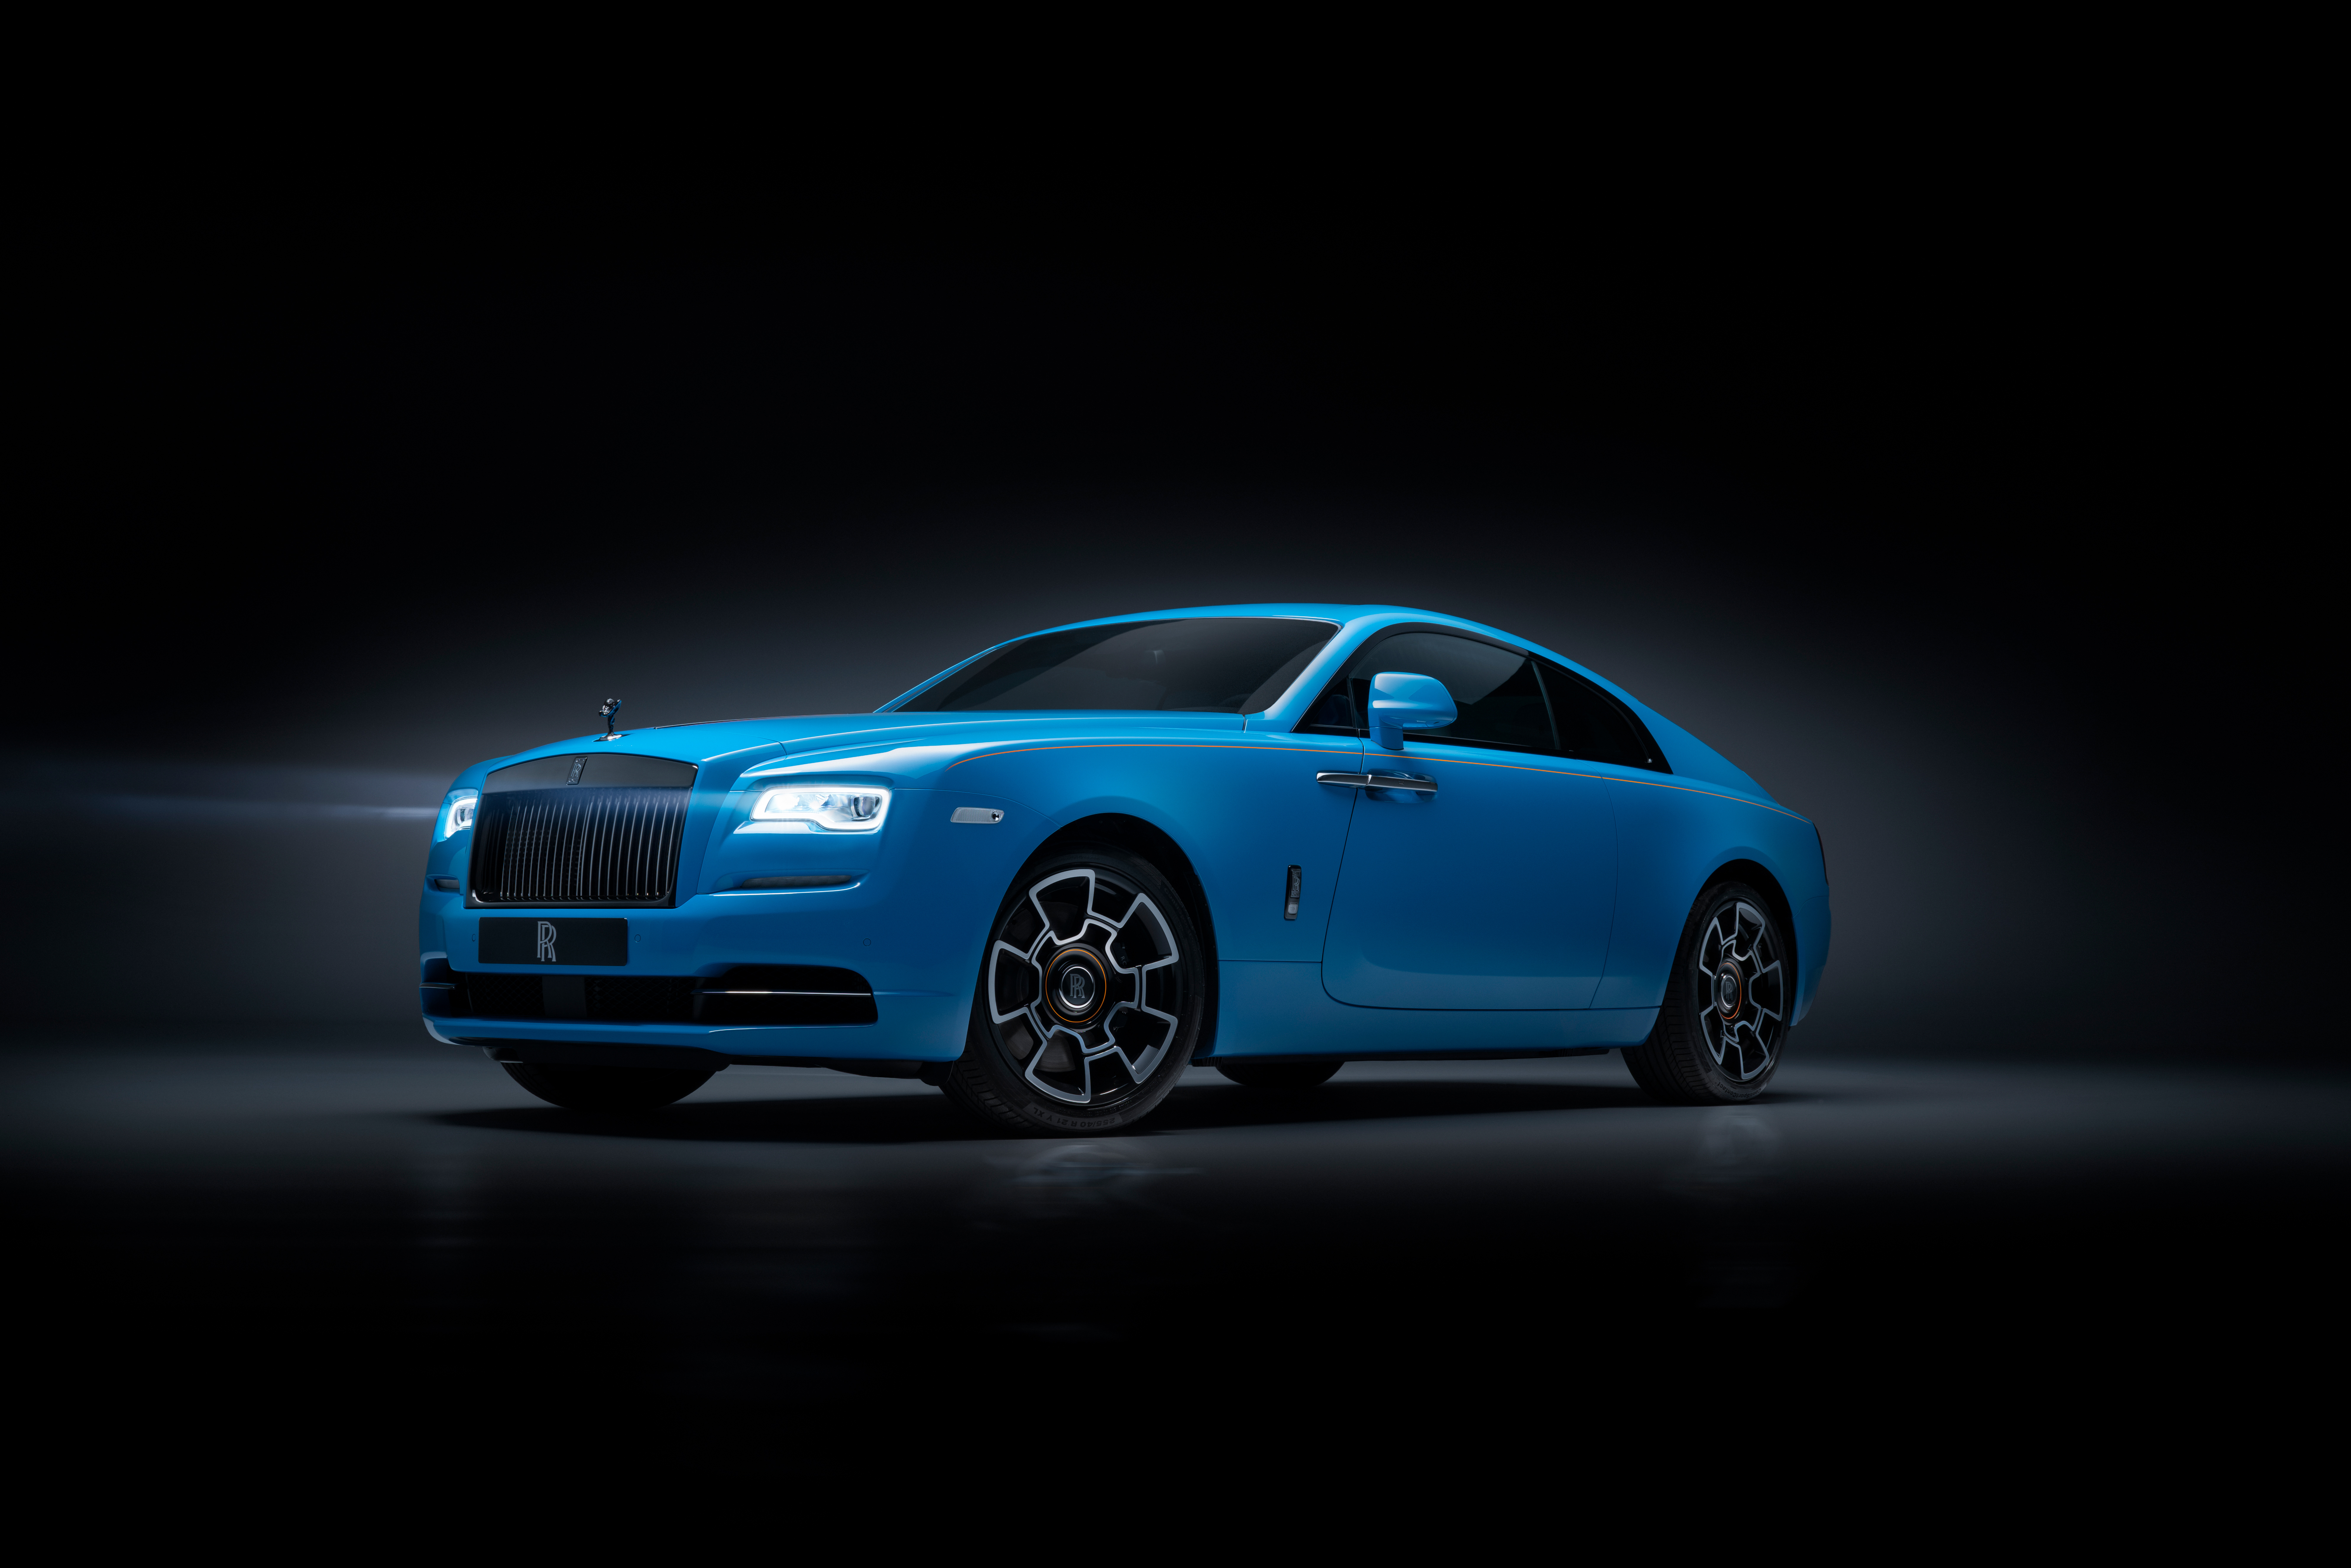 Rolls Royce Wraith Black Badge 2019, HD Cars, 4k ...